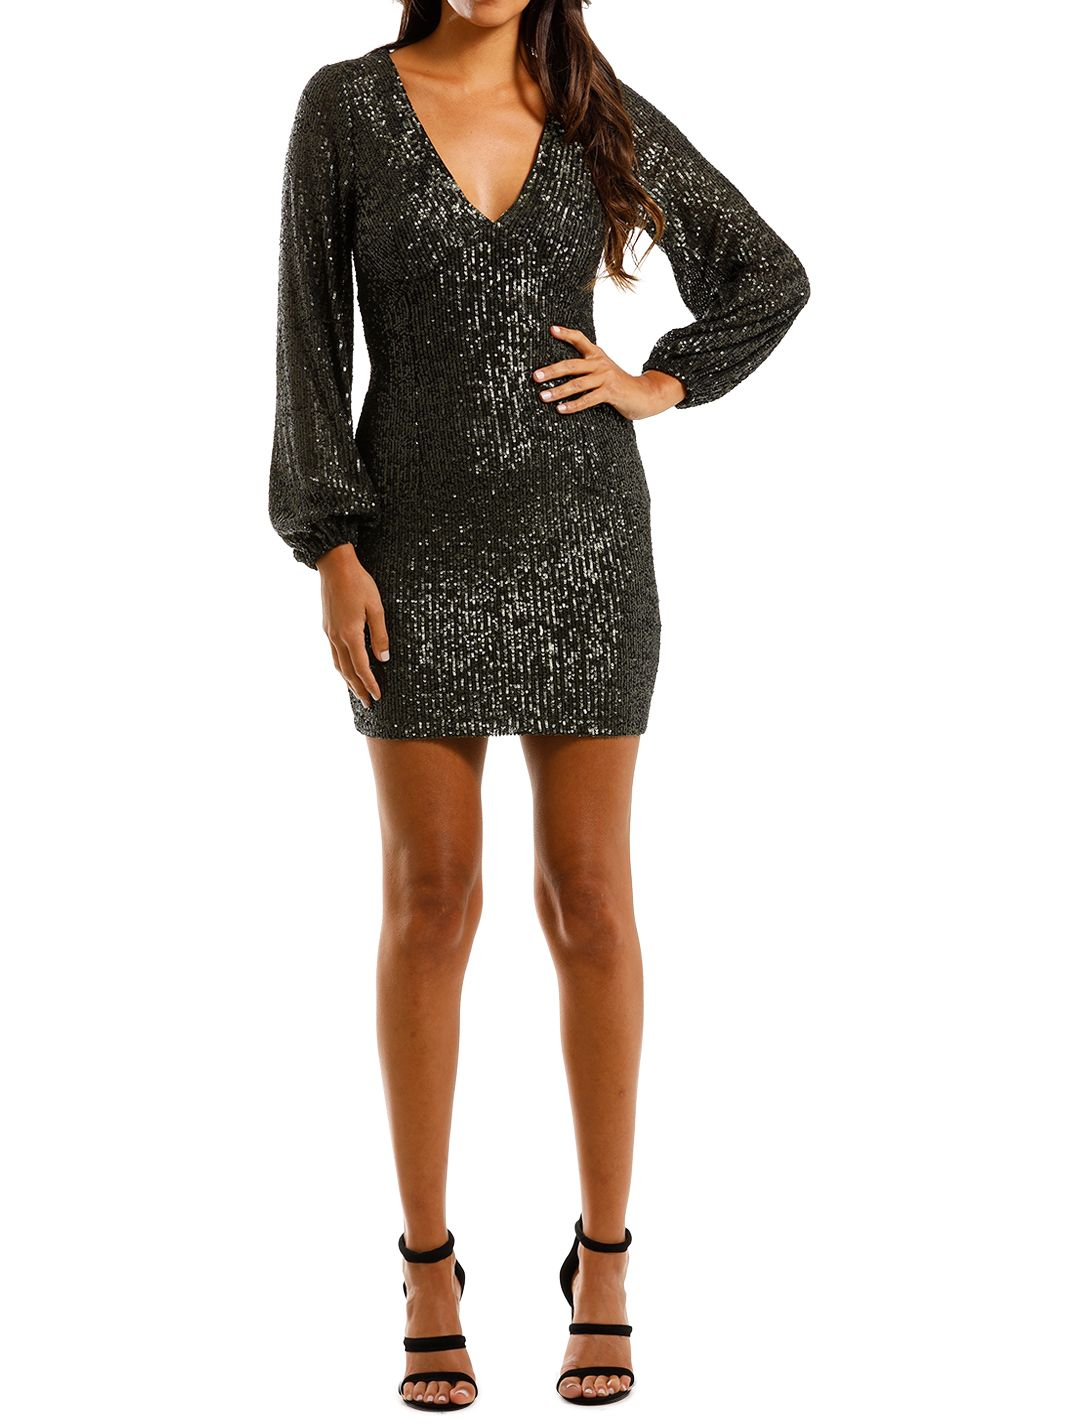 Pasduchas Spangle Dress Combat Mini Sequins Plunge V neckline